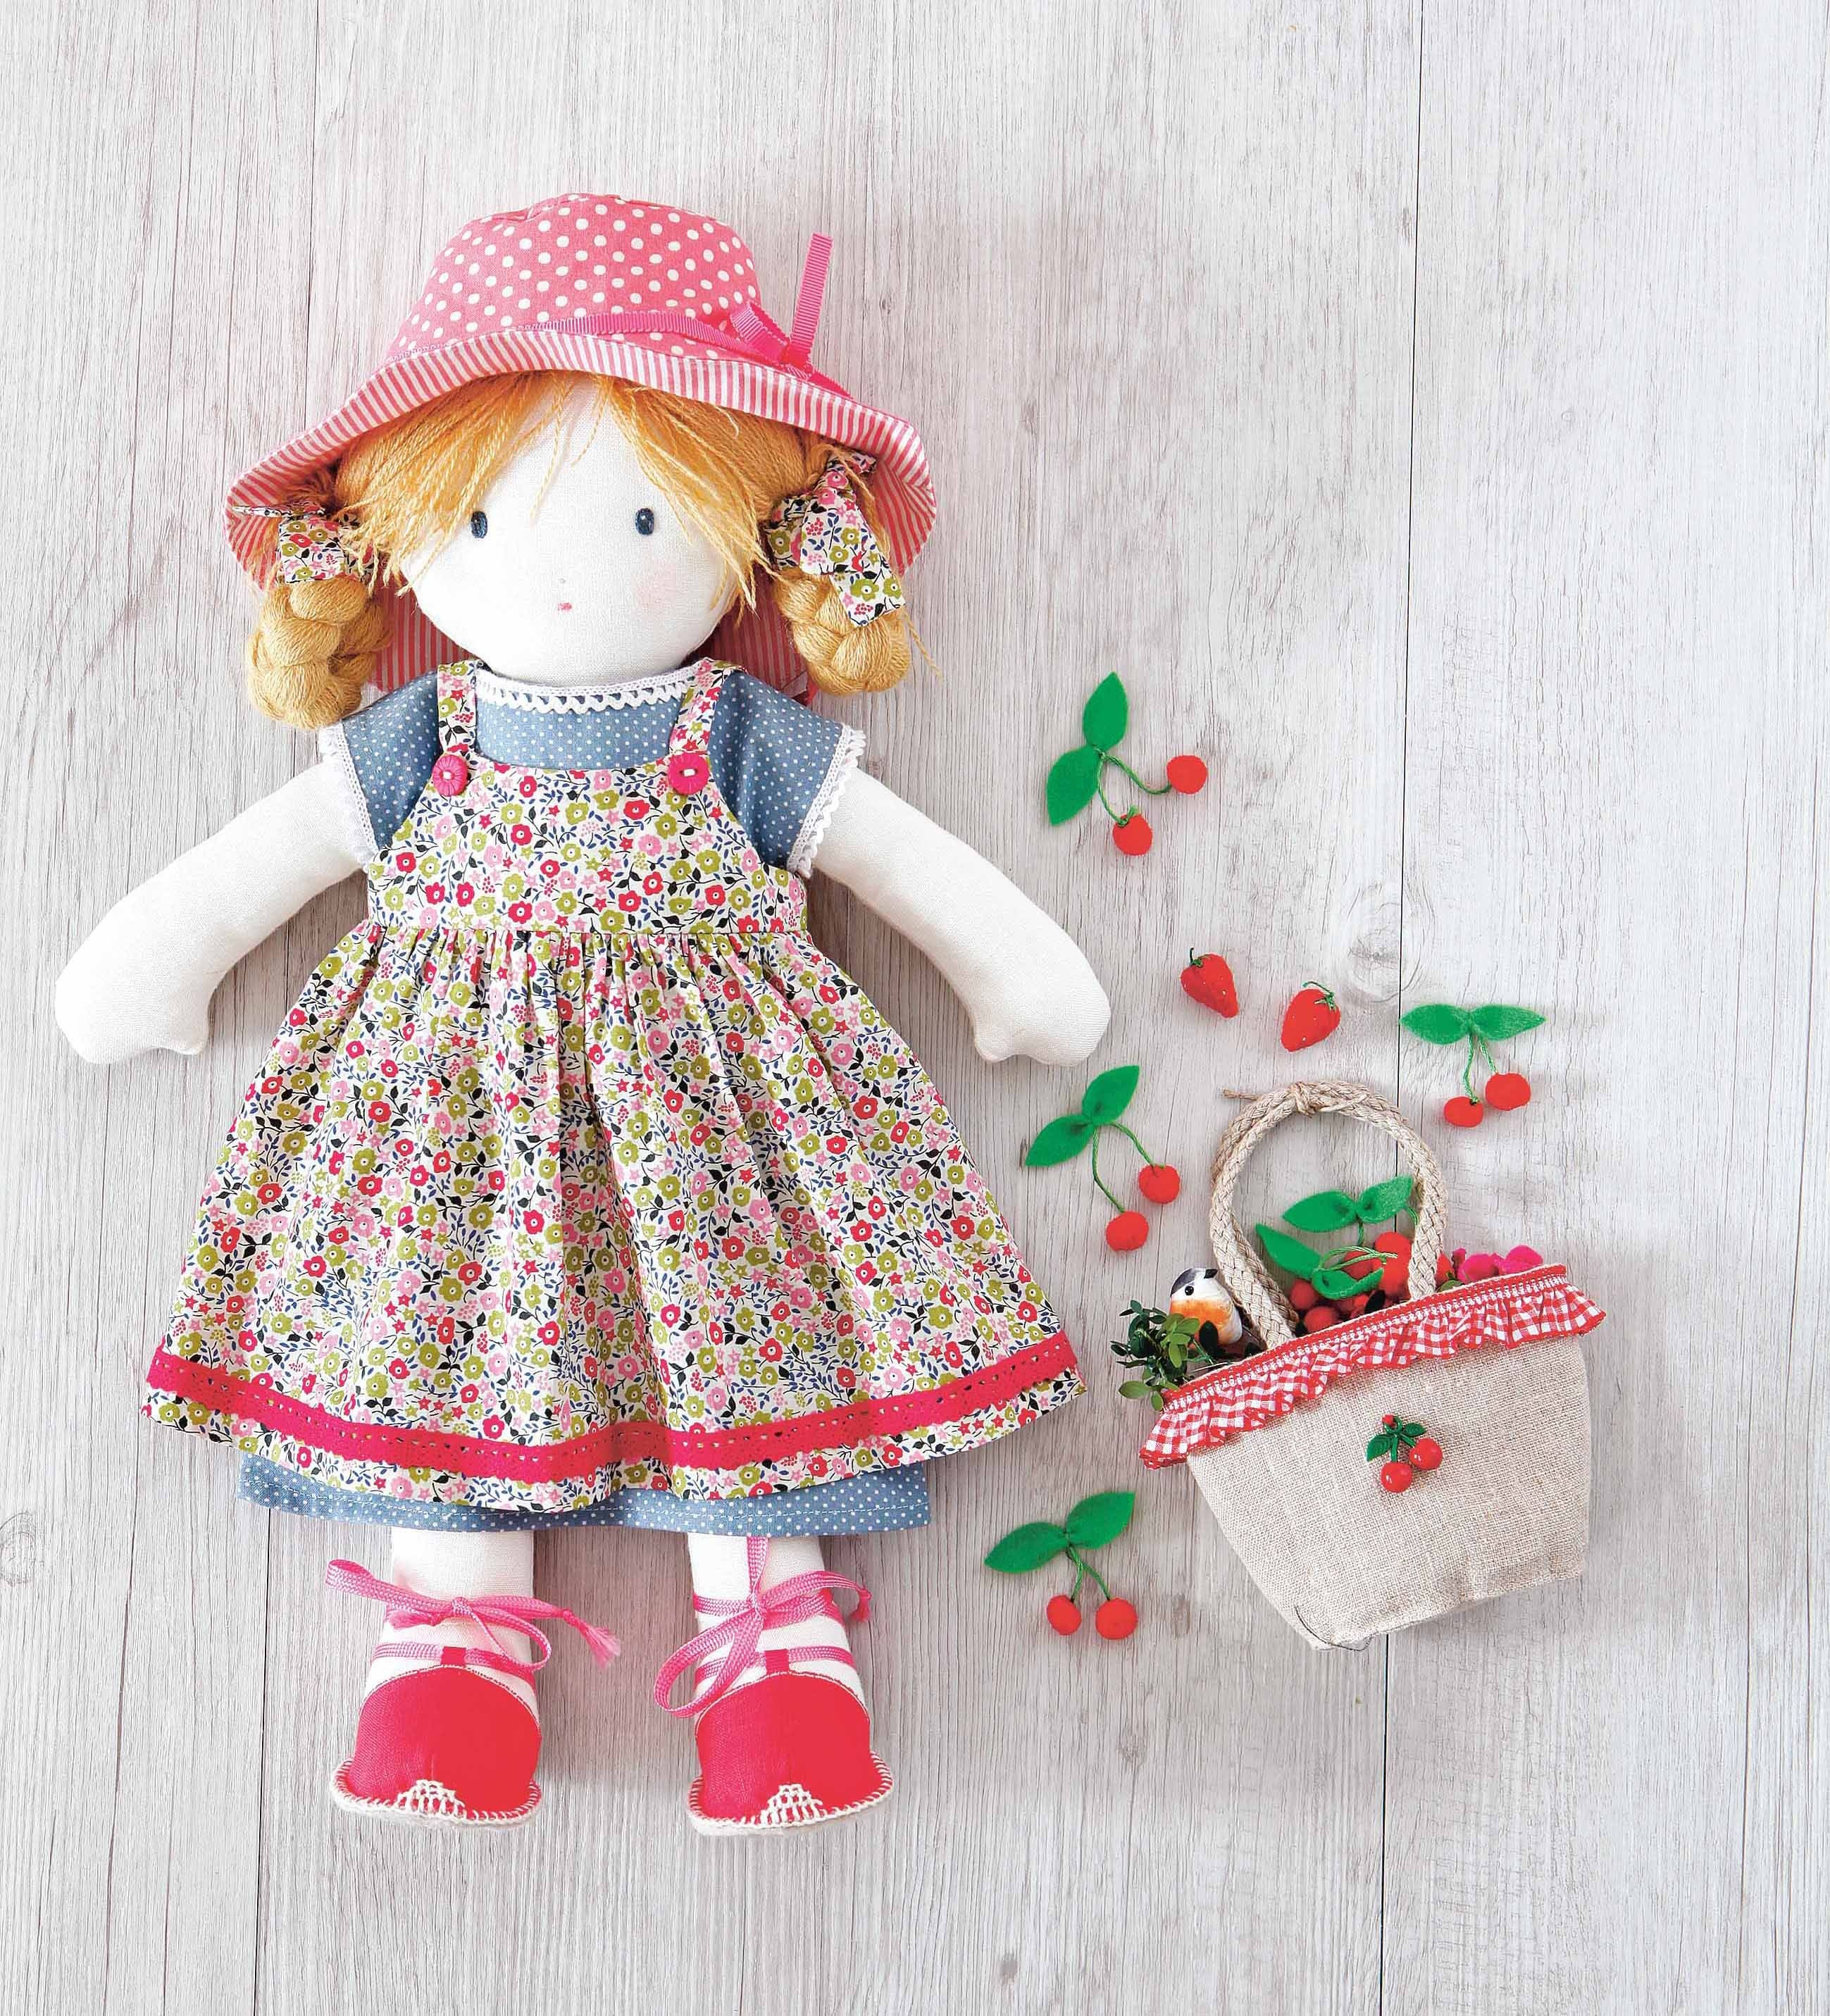 Pattern: Printable Rag Doll Sewing Pattern | Sewing | Doll Sewing - Free Printable Cloth Doll Sewing Patterns